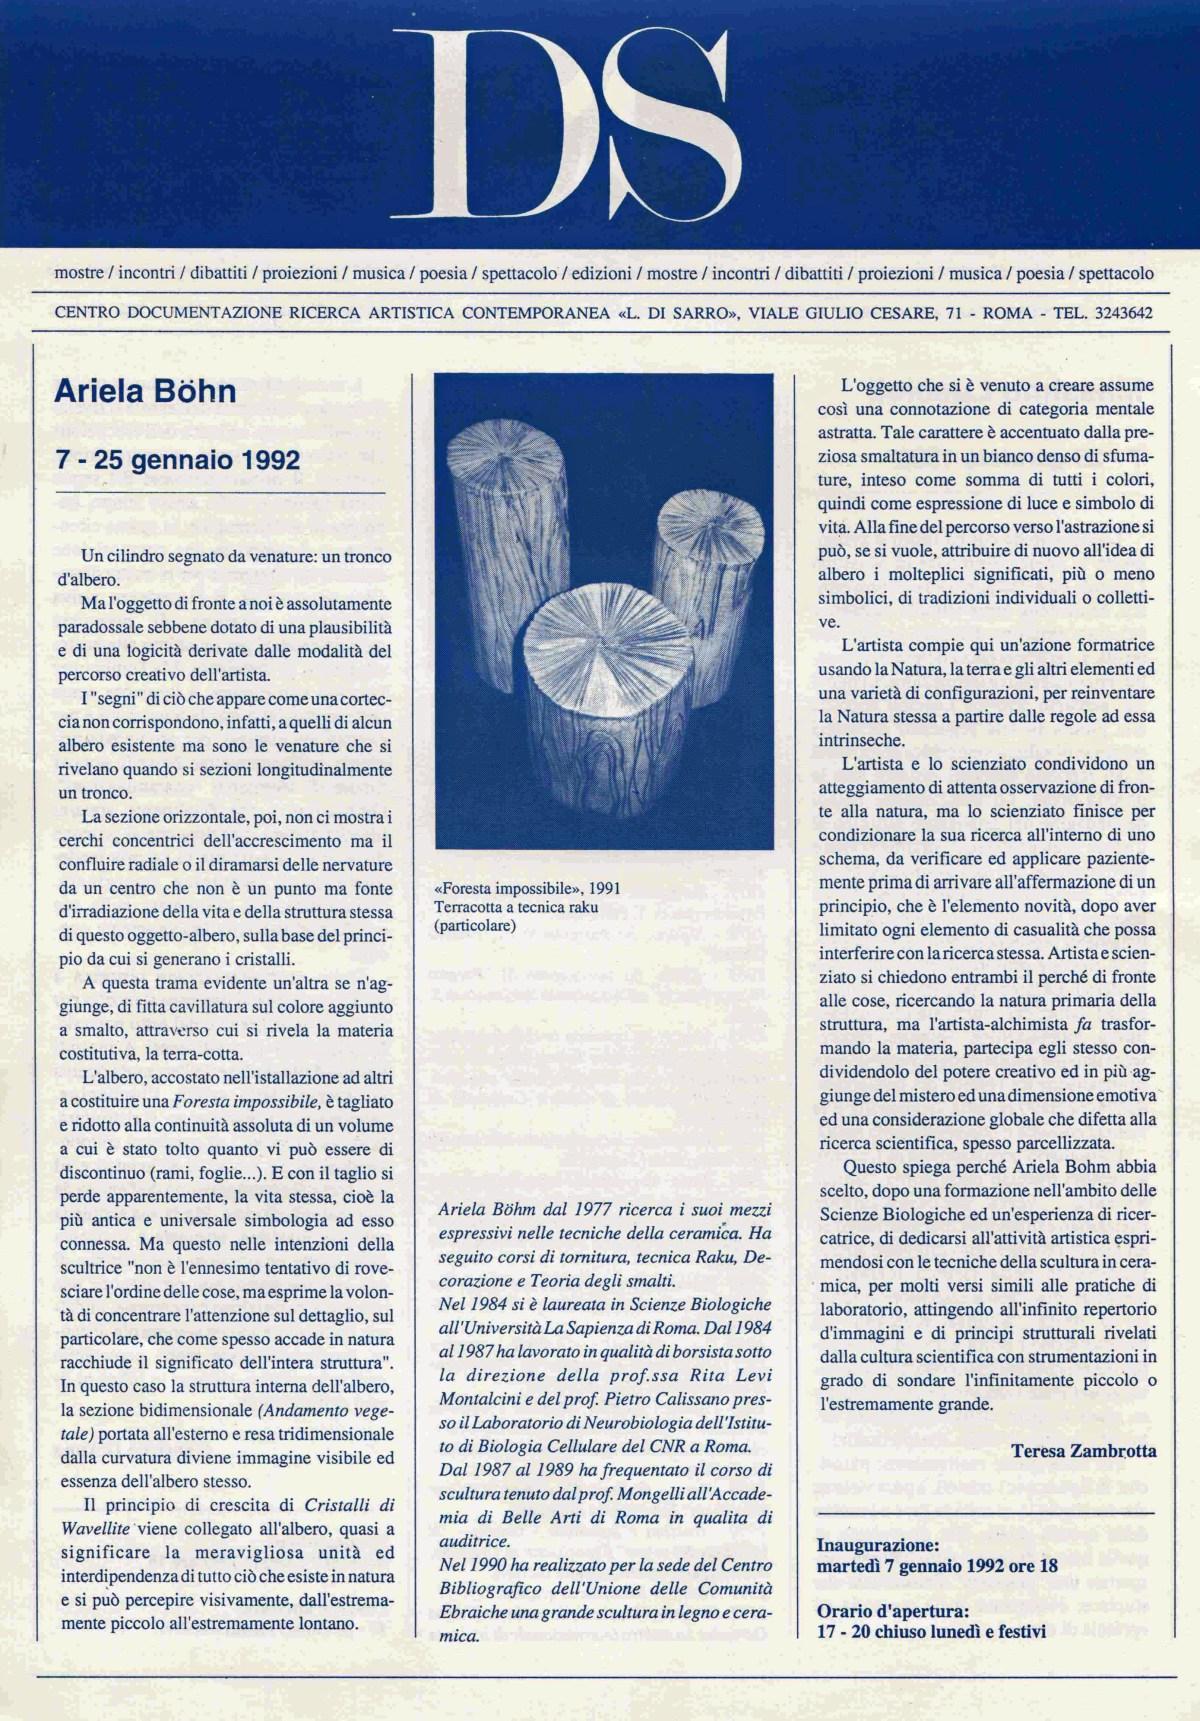 Ariela Bohm, Massimo Luccioli  7 - 25 gennaio 1992